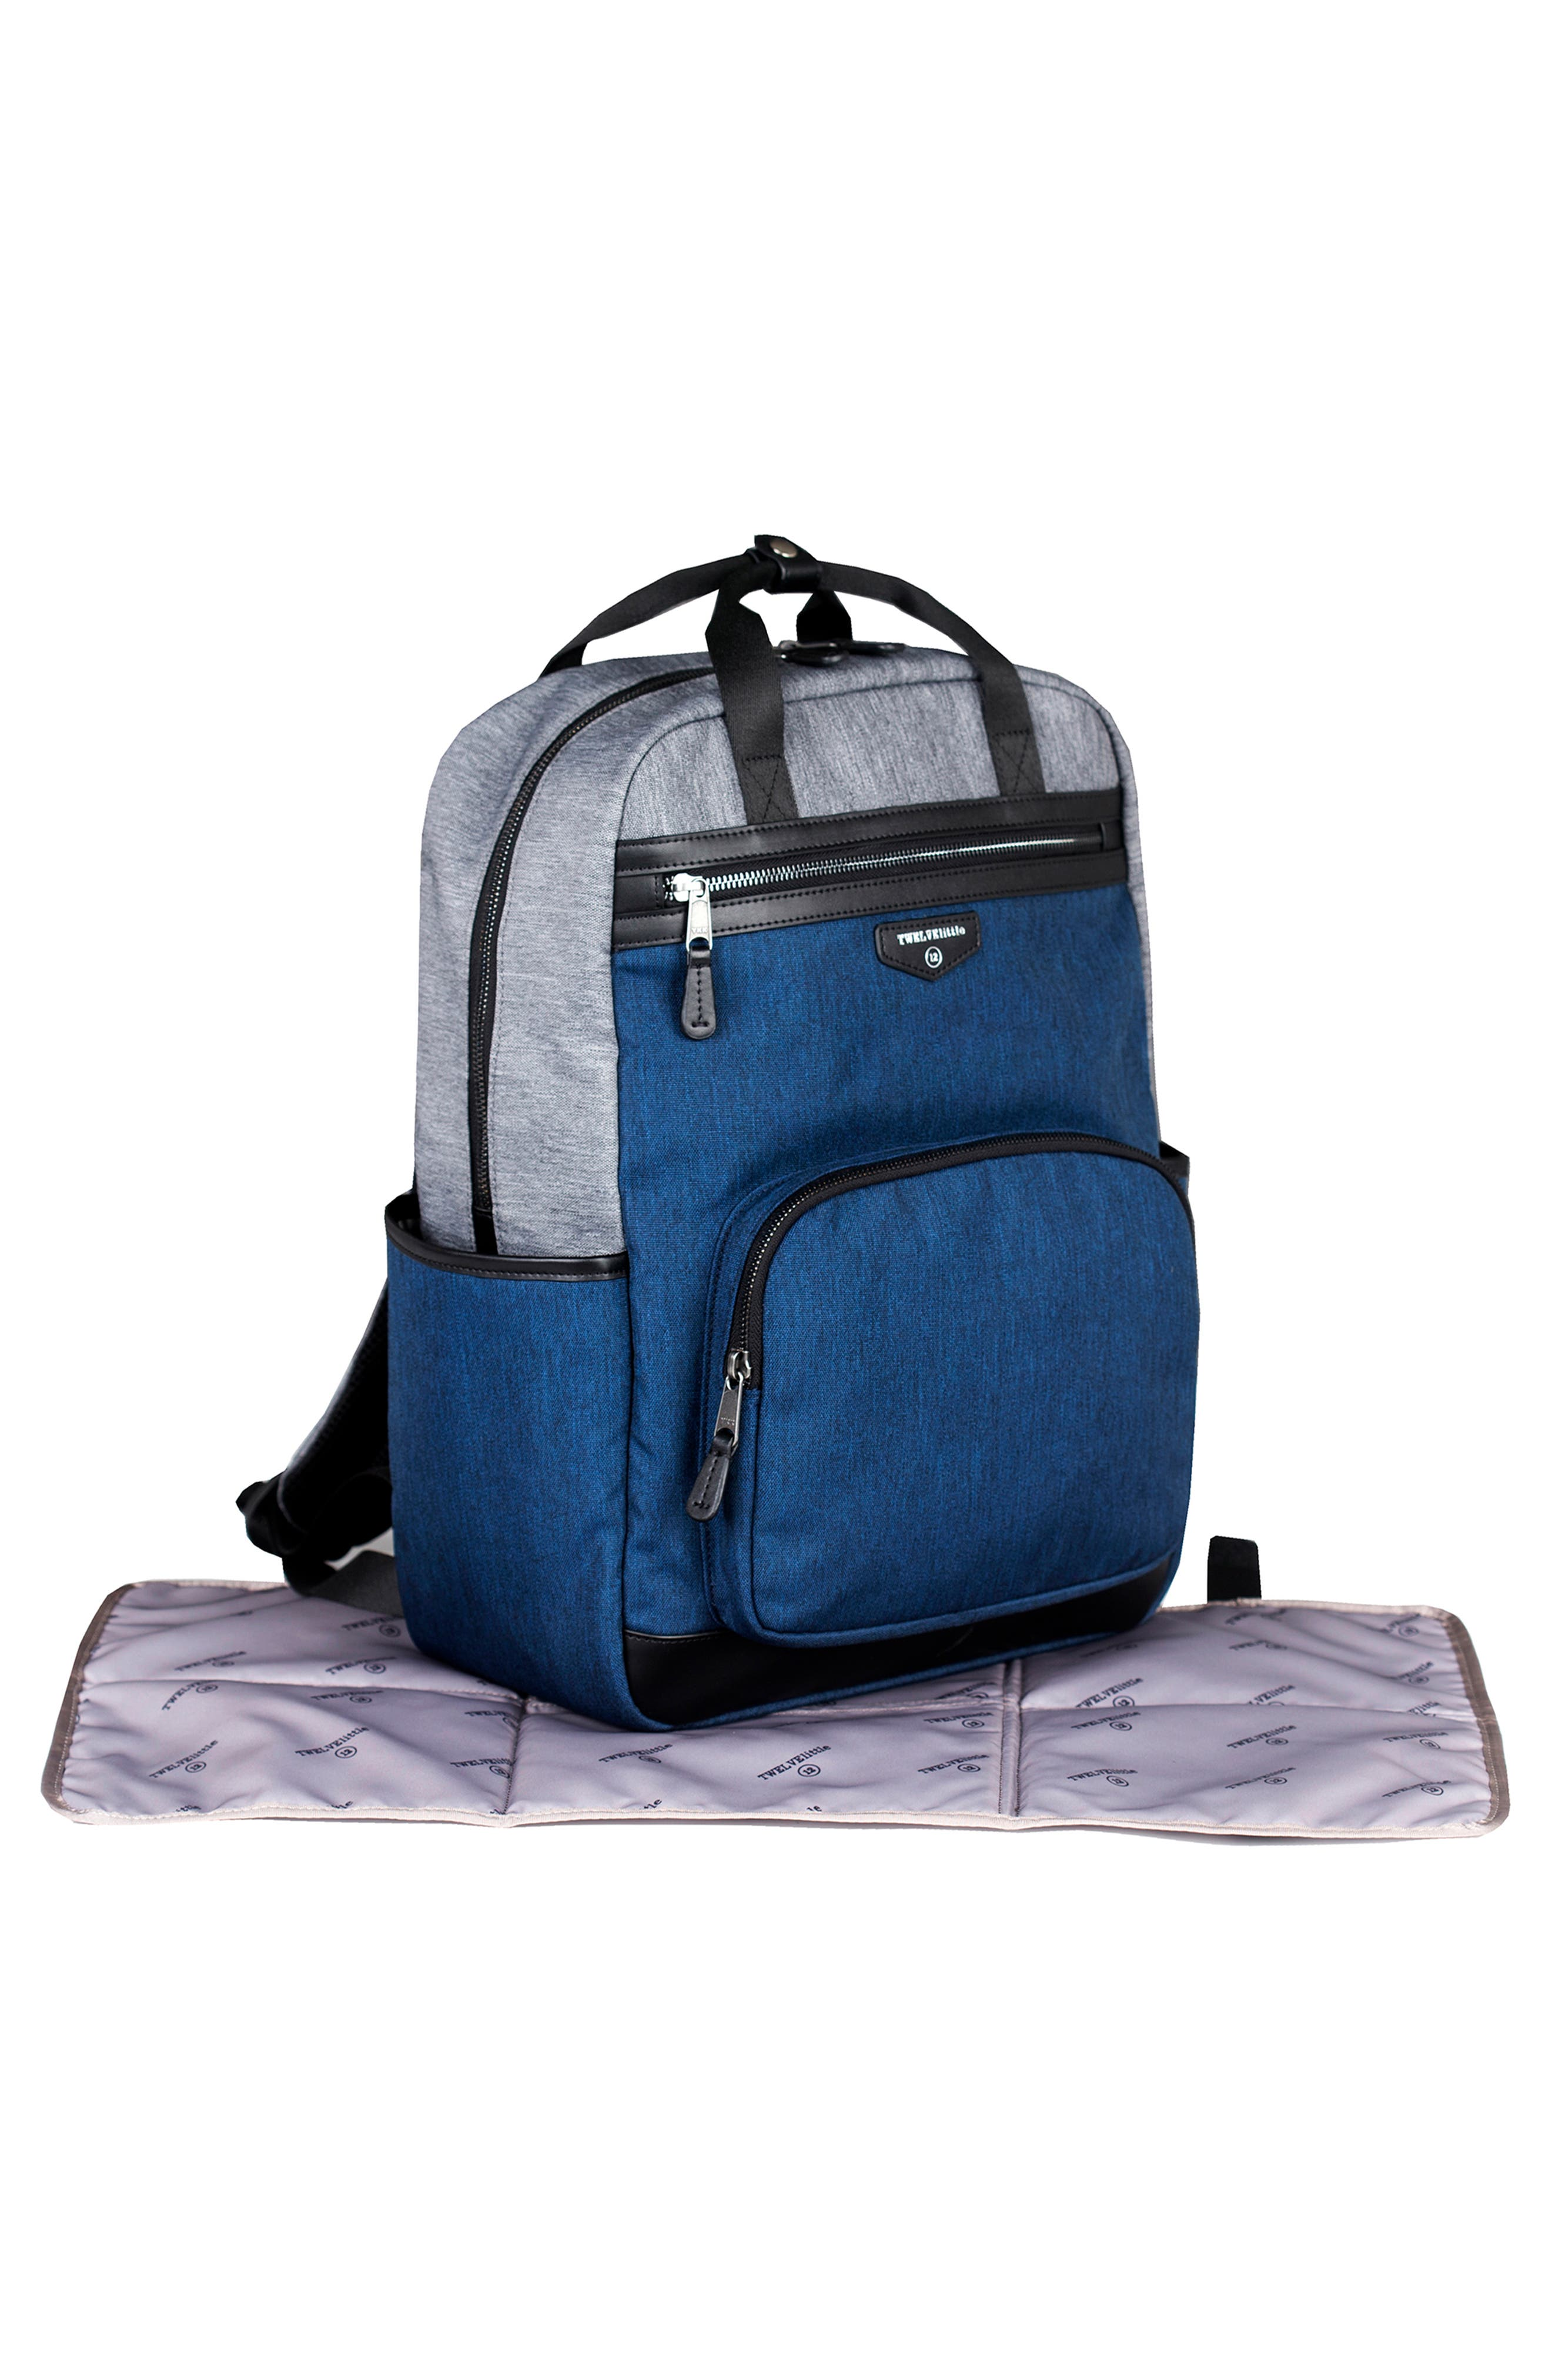 'Courage' Unisex Backpack Diaper Bag,                             Alternate thumbnail 3, color,                             020